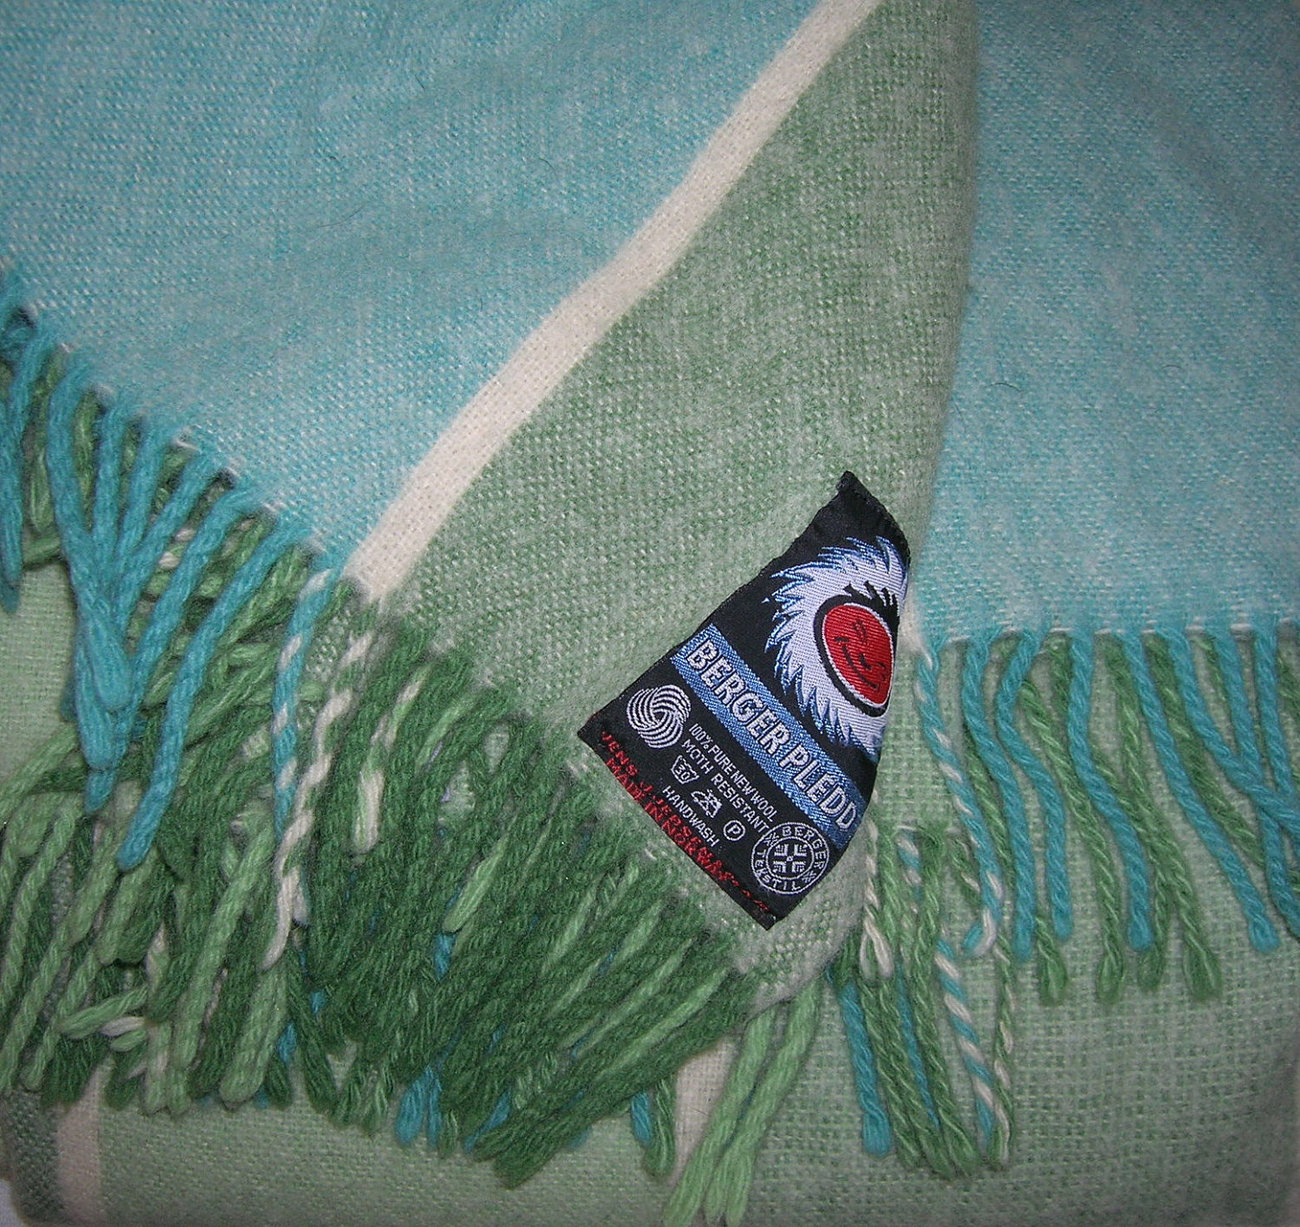 Vintage Berger Pledd Striped Wool Throw  Stadium Blanket in Green Teal Cream